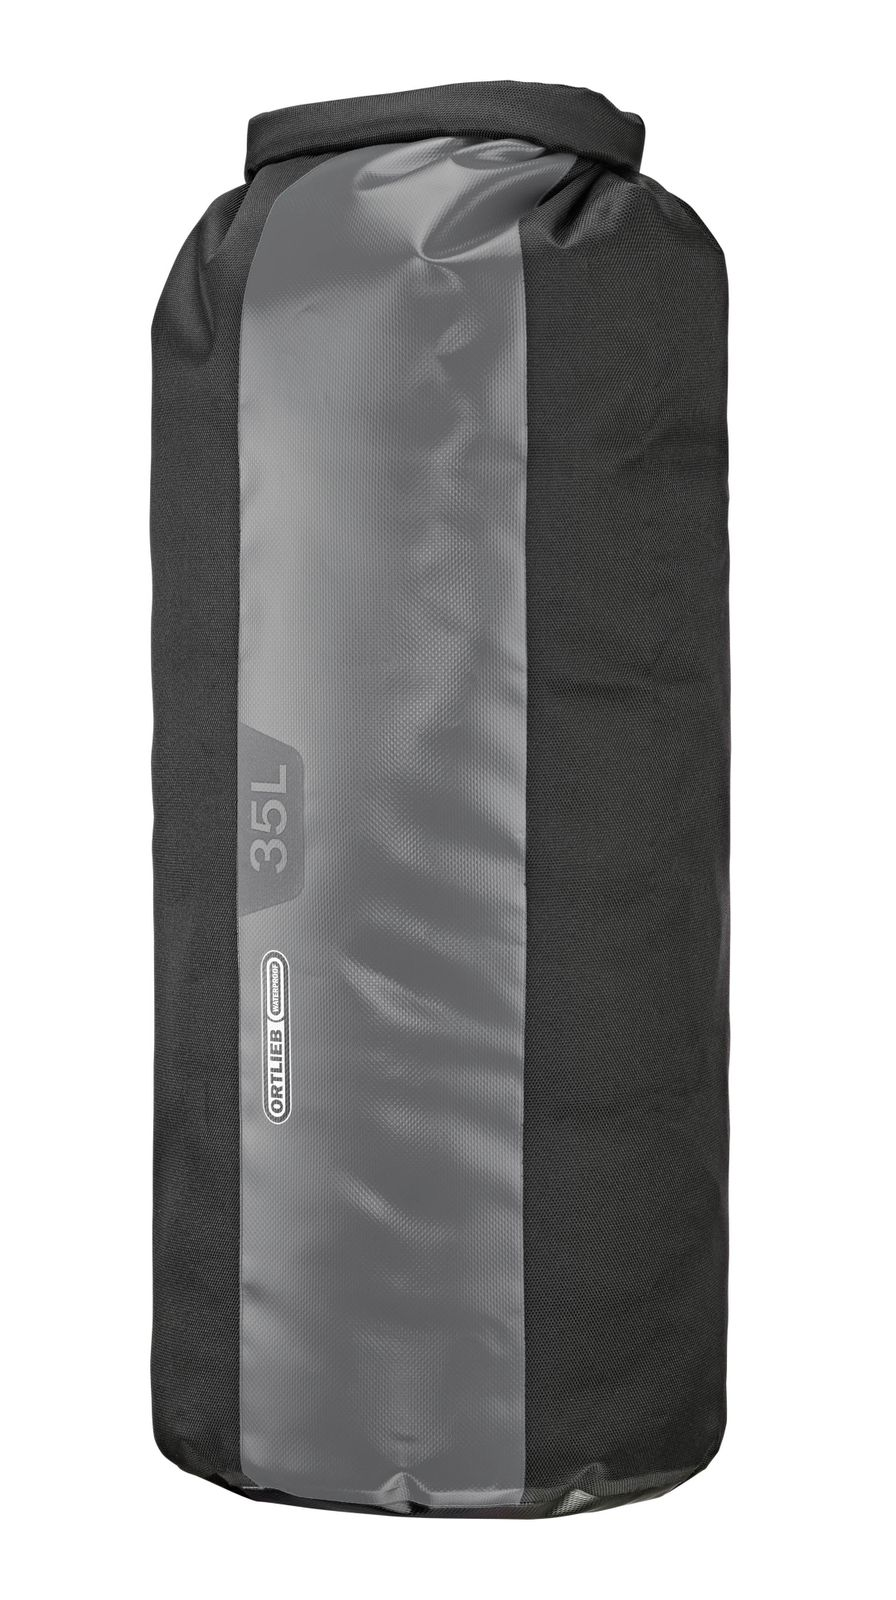 ORTLIEB Dry-Bag PS490 35L Black-Grey